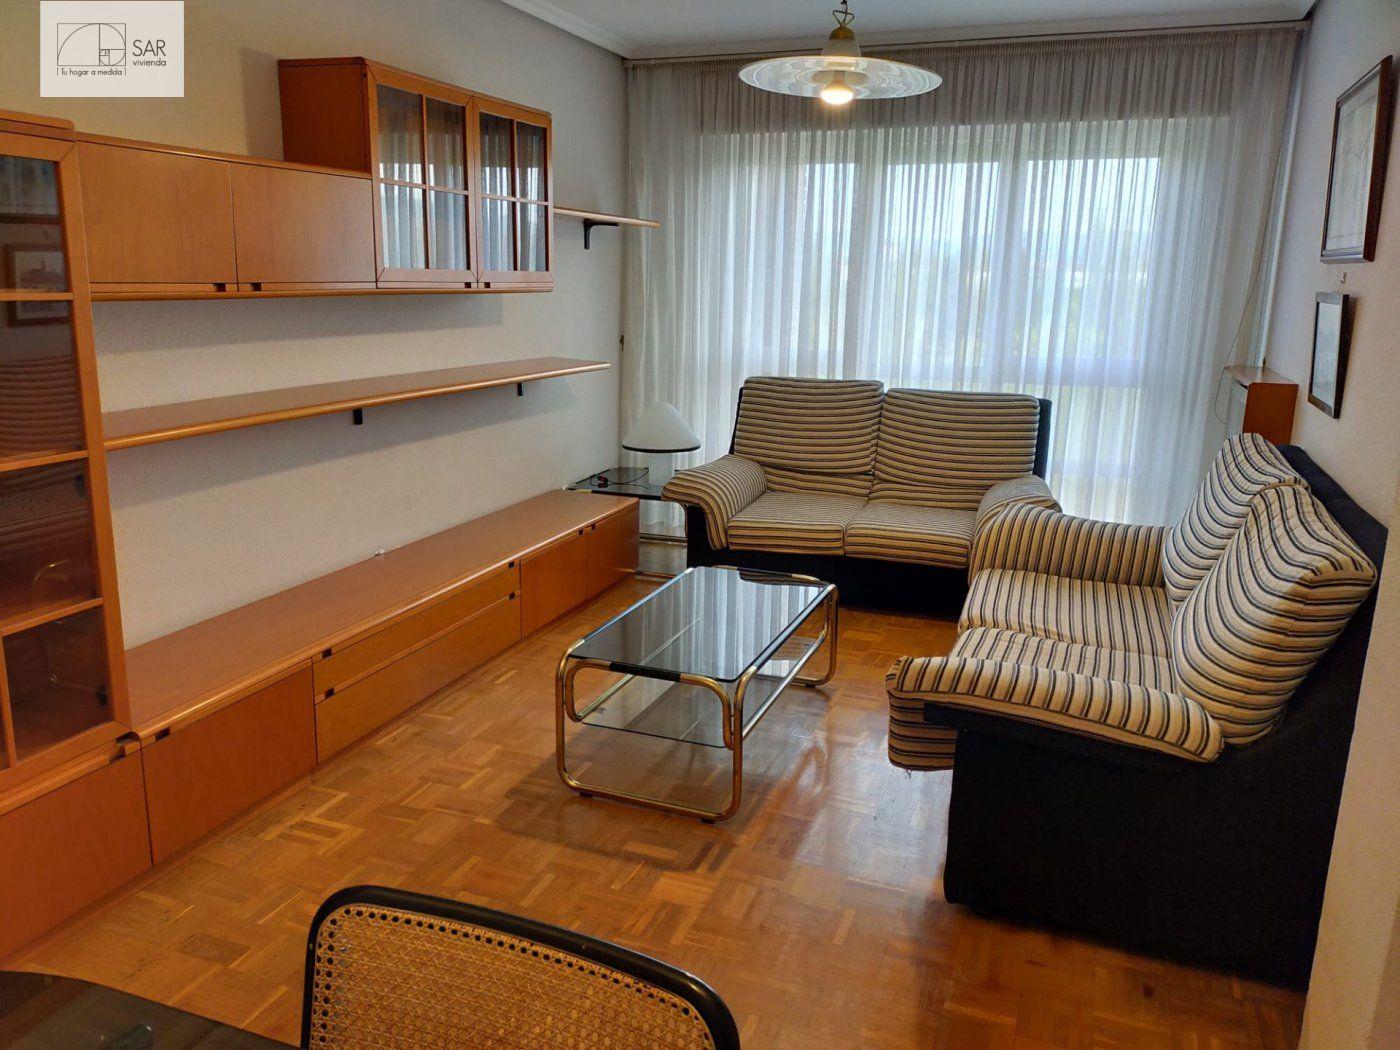 Apartamento, Lakua - Arriaga, Venta - Álava (Álava)